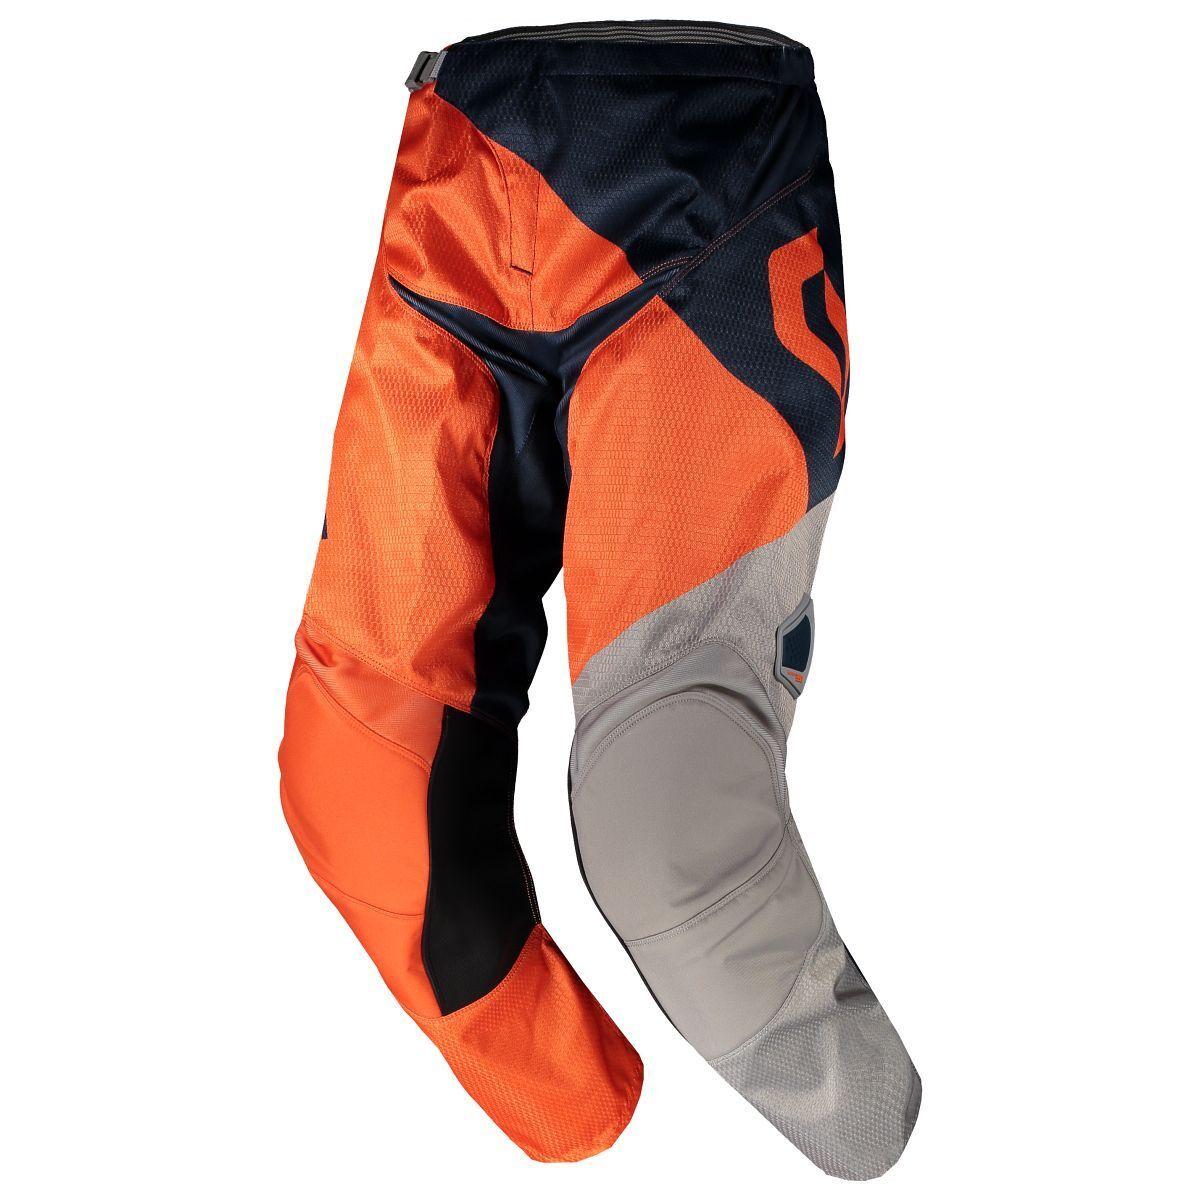 Scott 350 Dirt MX Motocross / DH Fahrrad Hose Orange/blau 2019